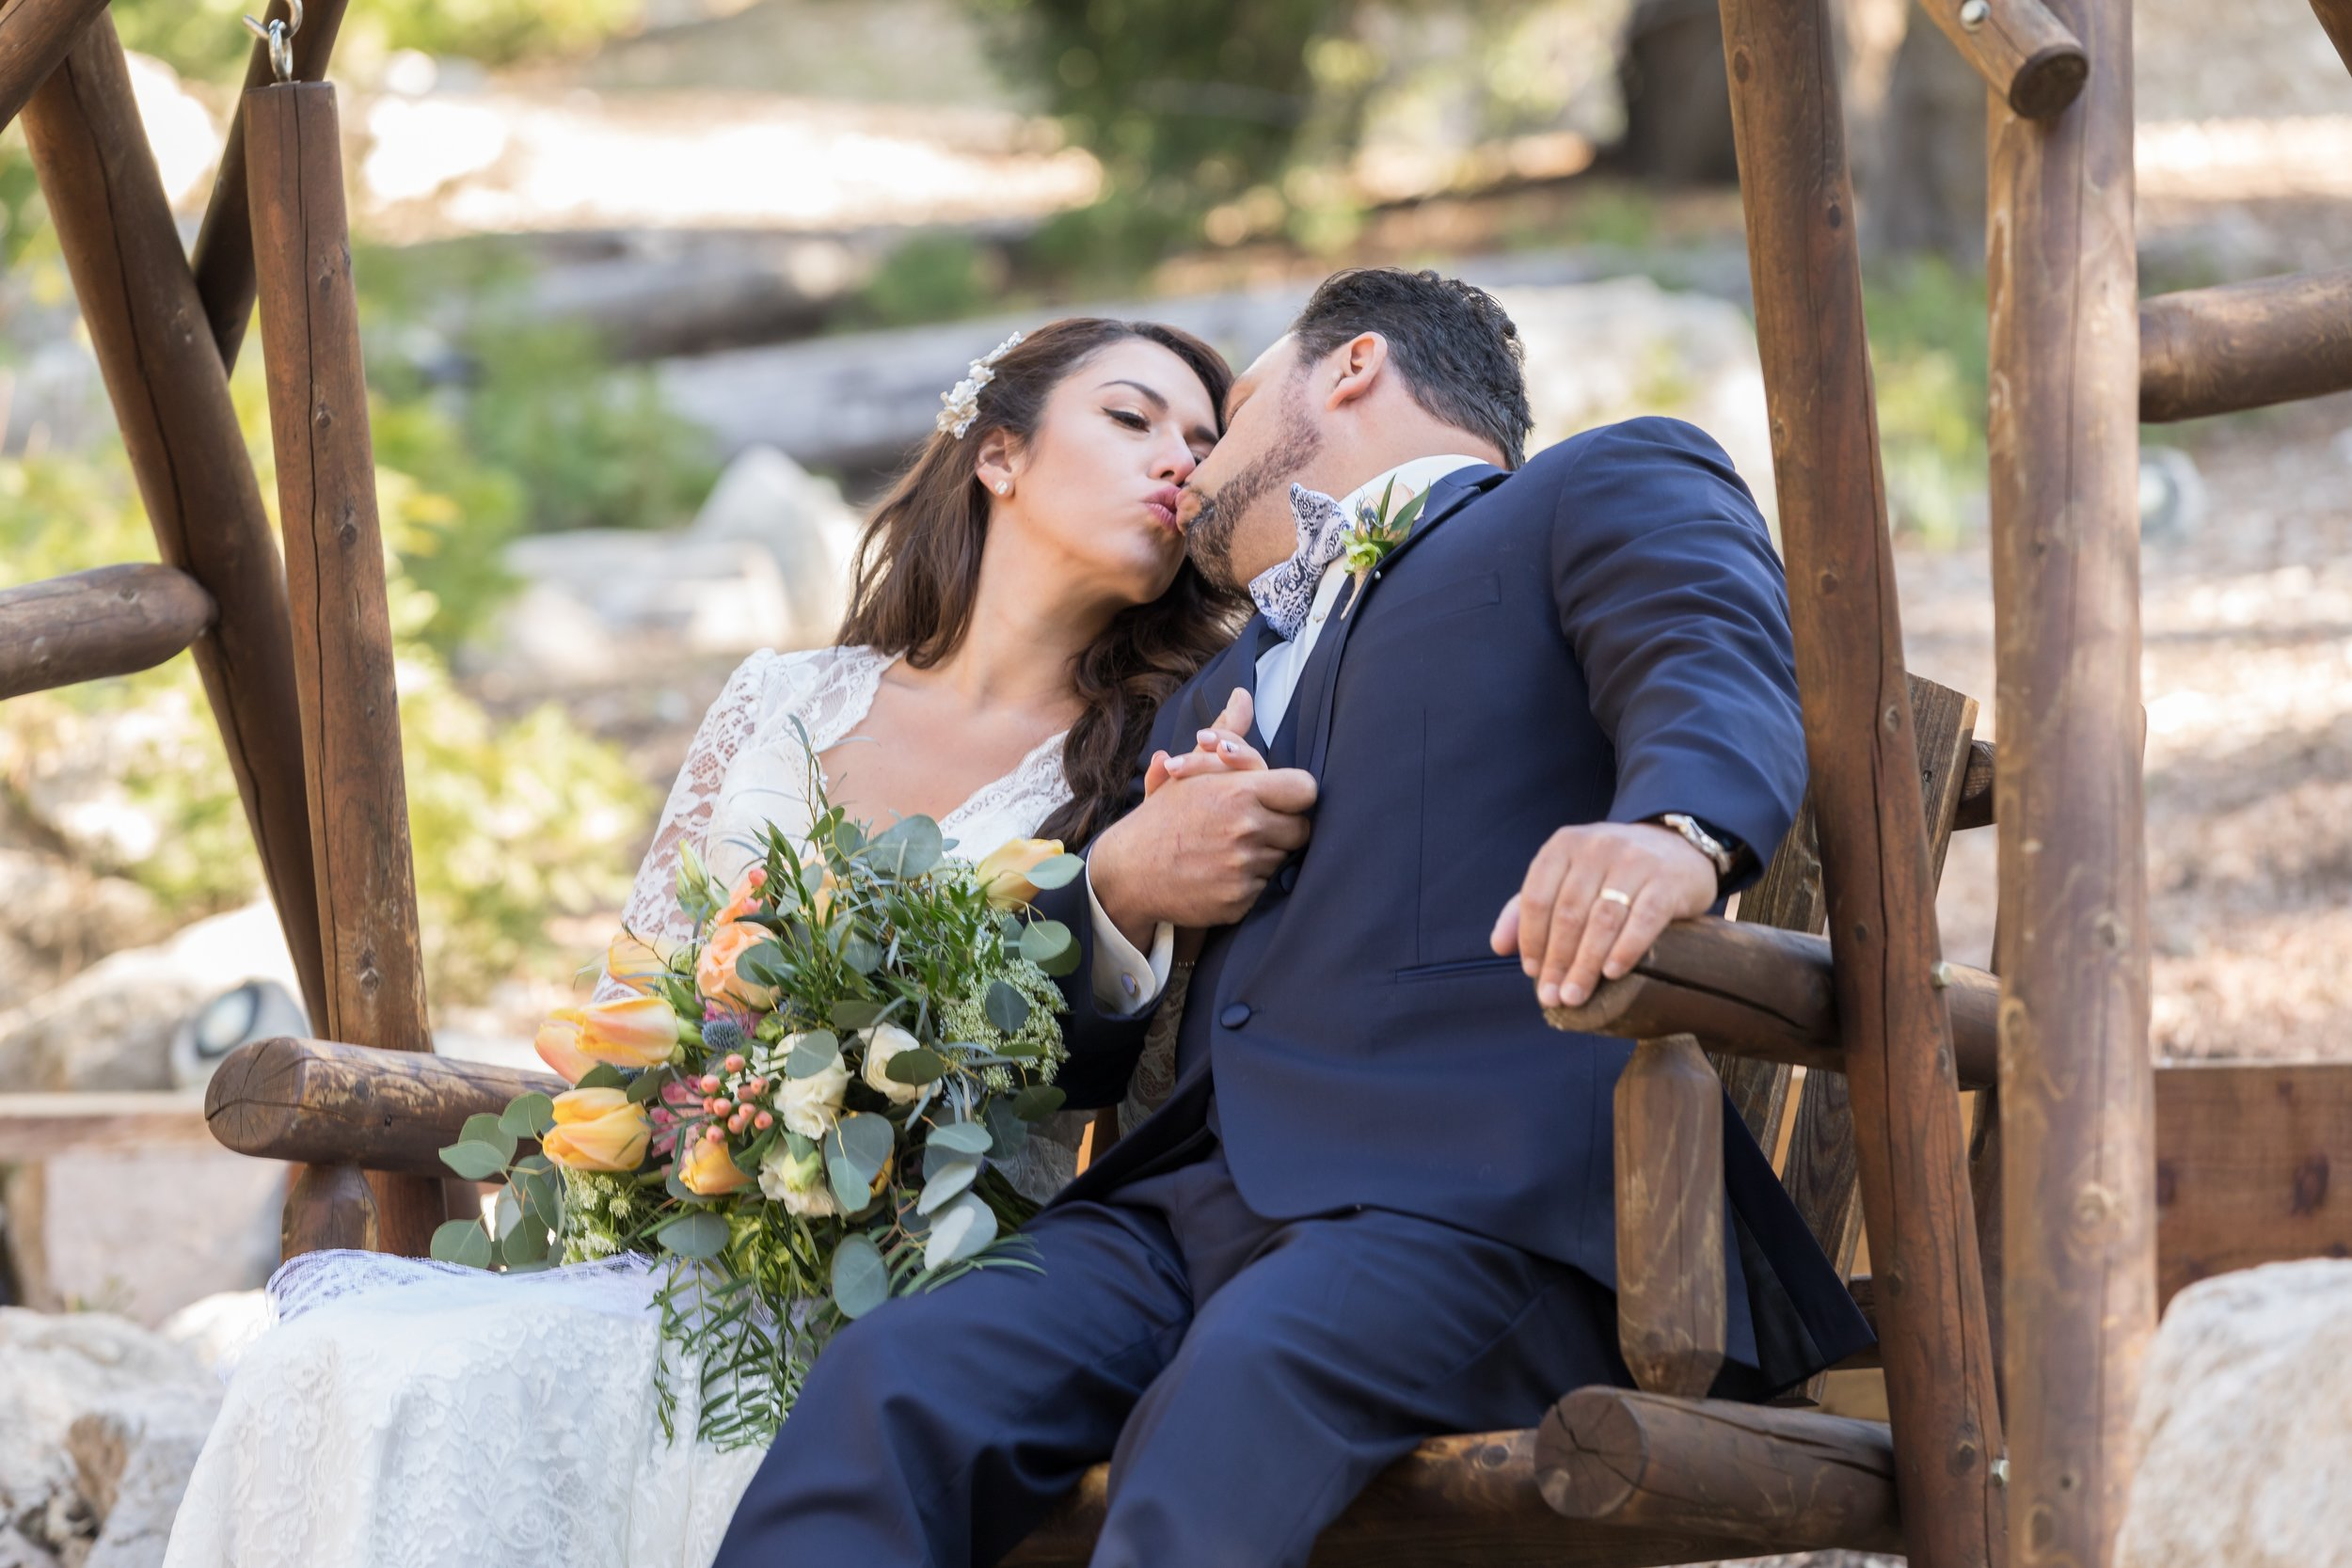 ! Rustic Wedding Photography Kissing on the Swings.jpg